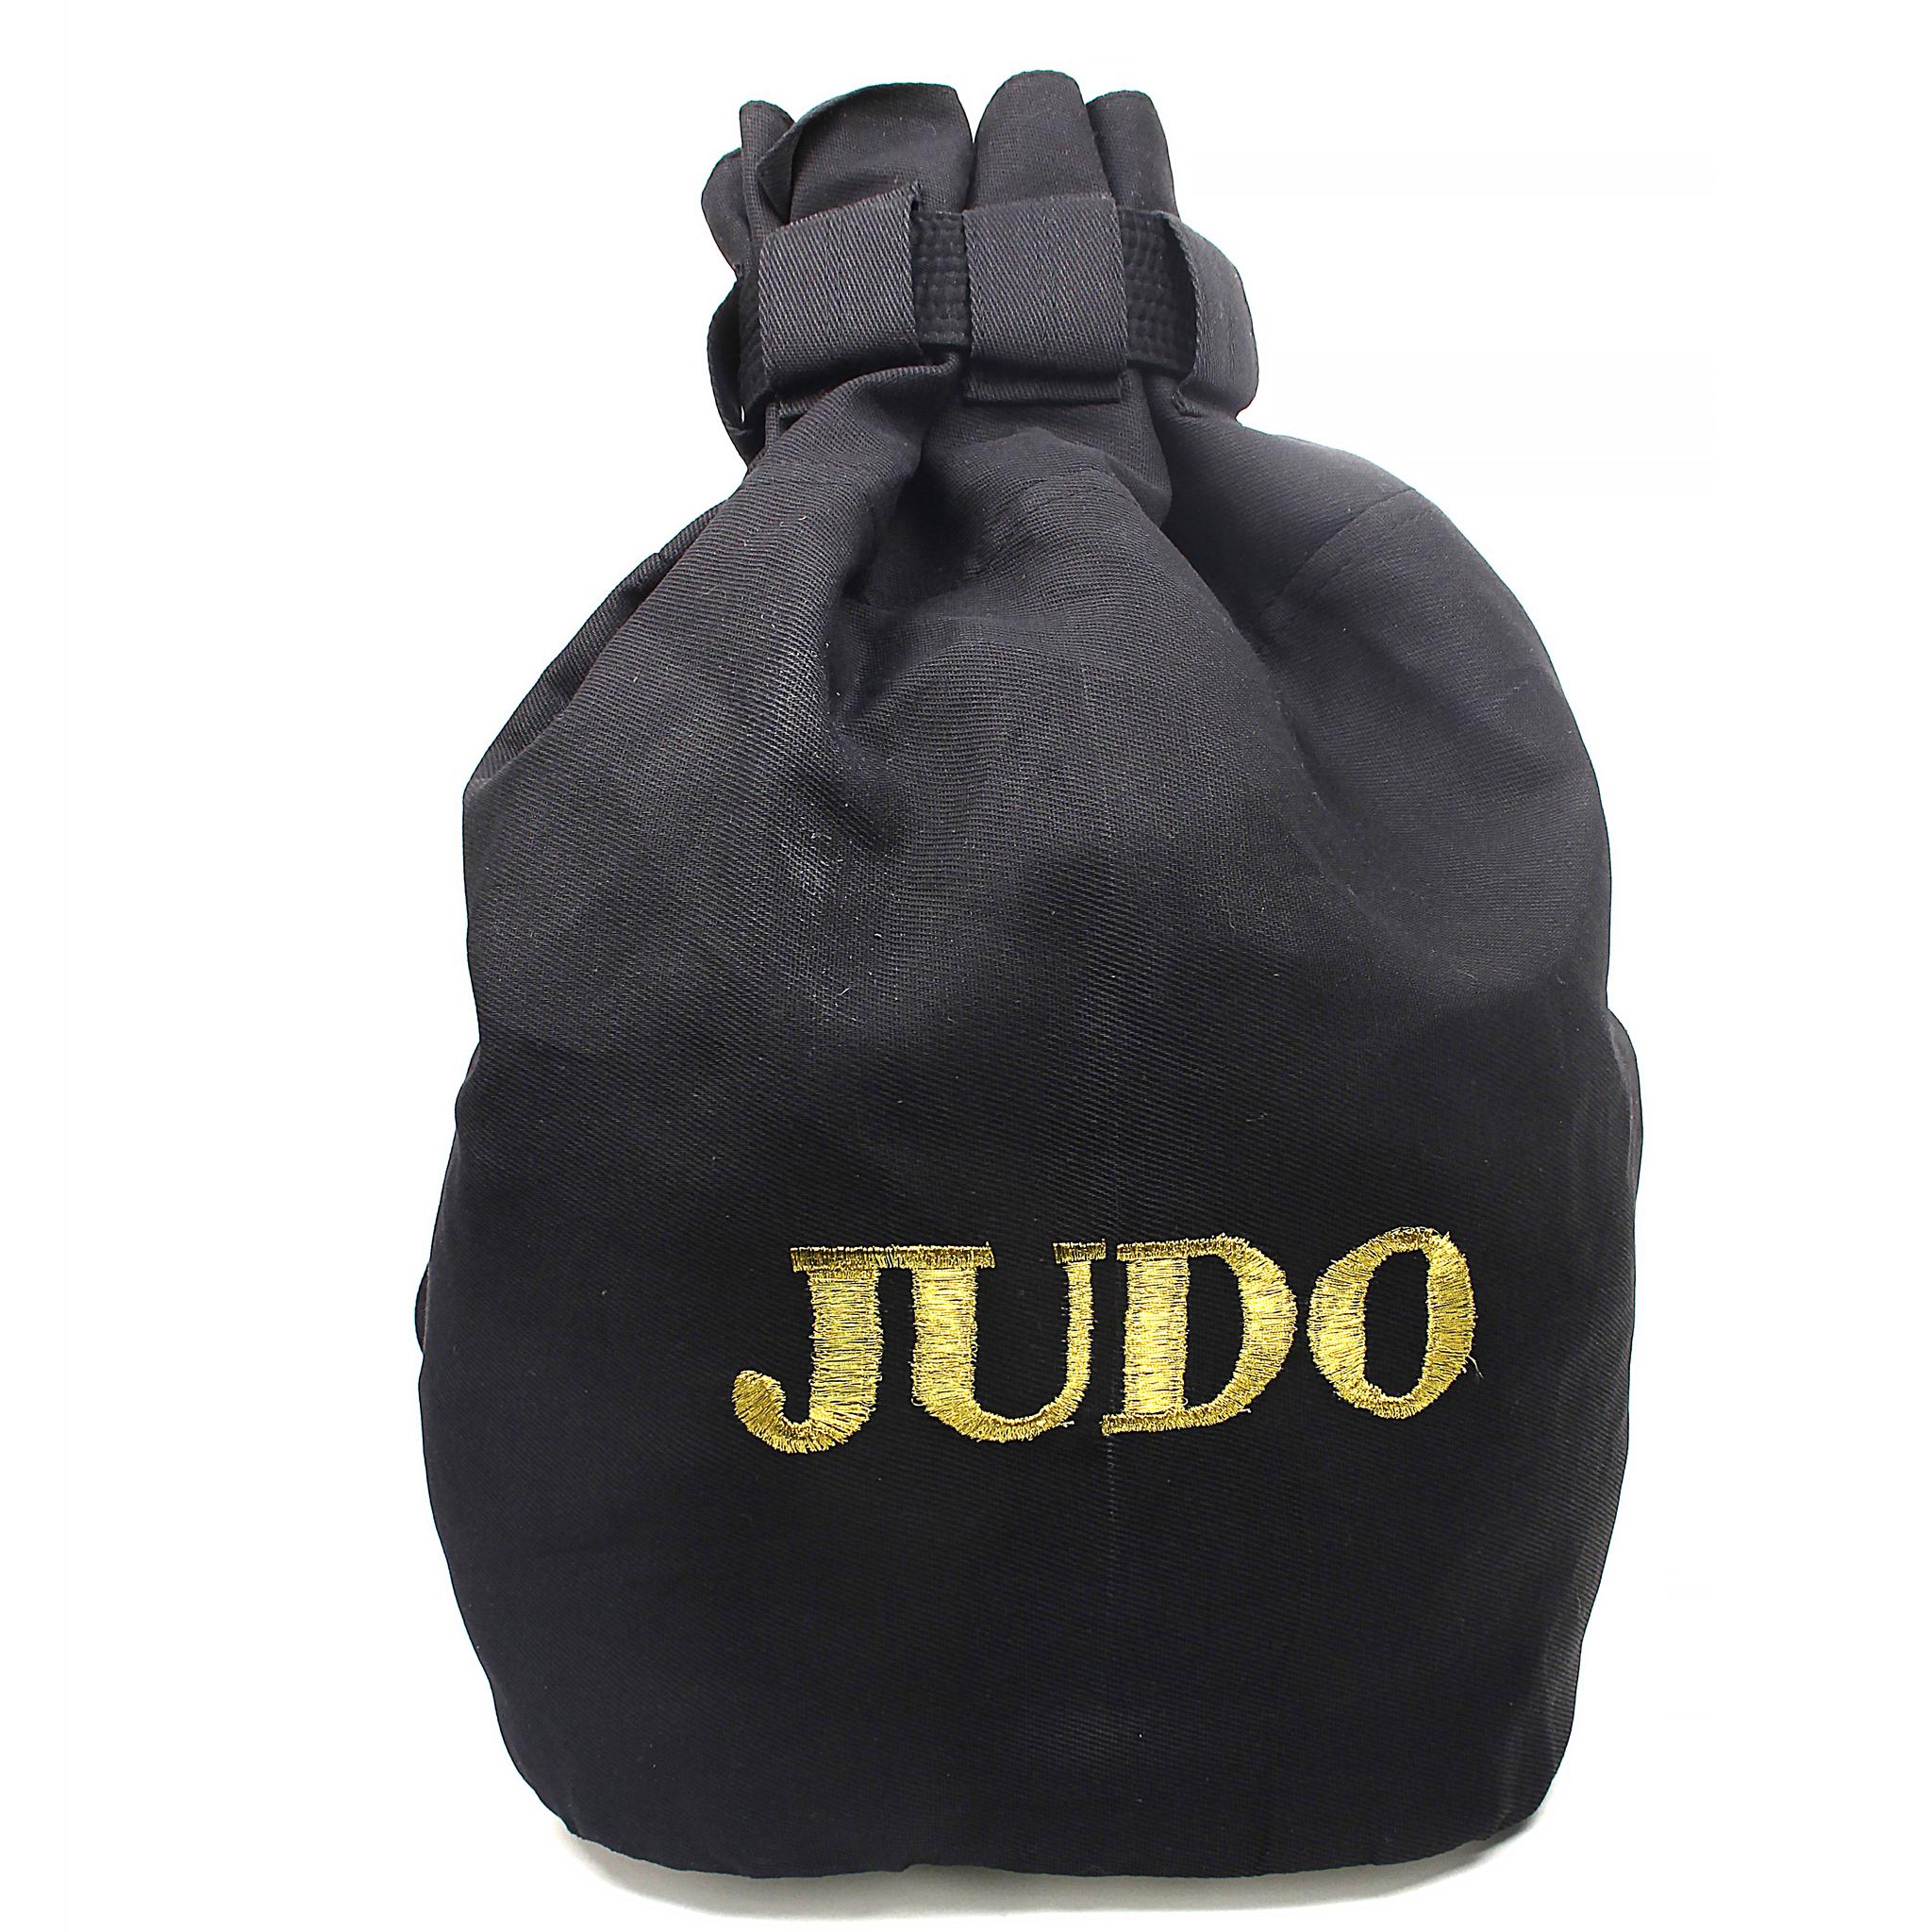 Дзюдо Сумка-мешок для экипировки дзюдо _MG_0731.jpg